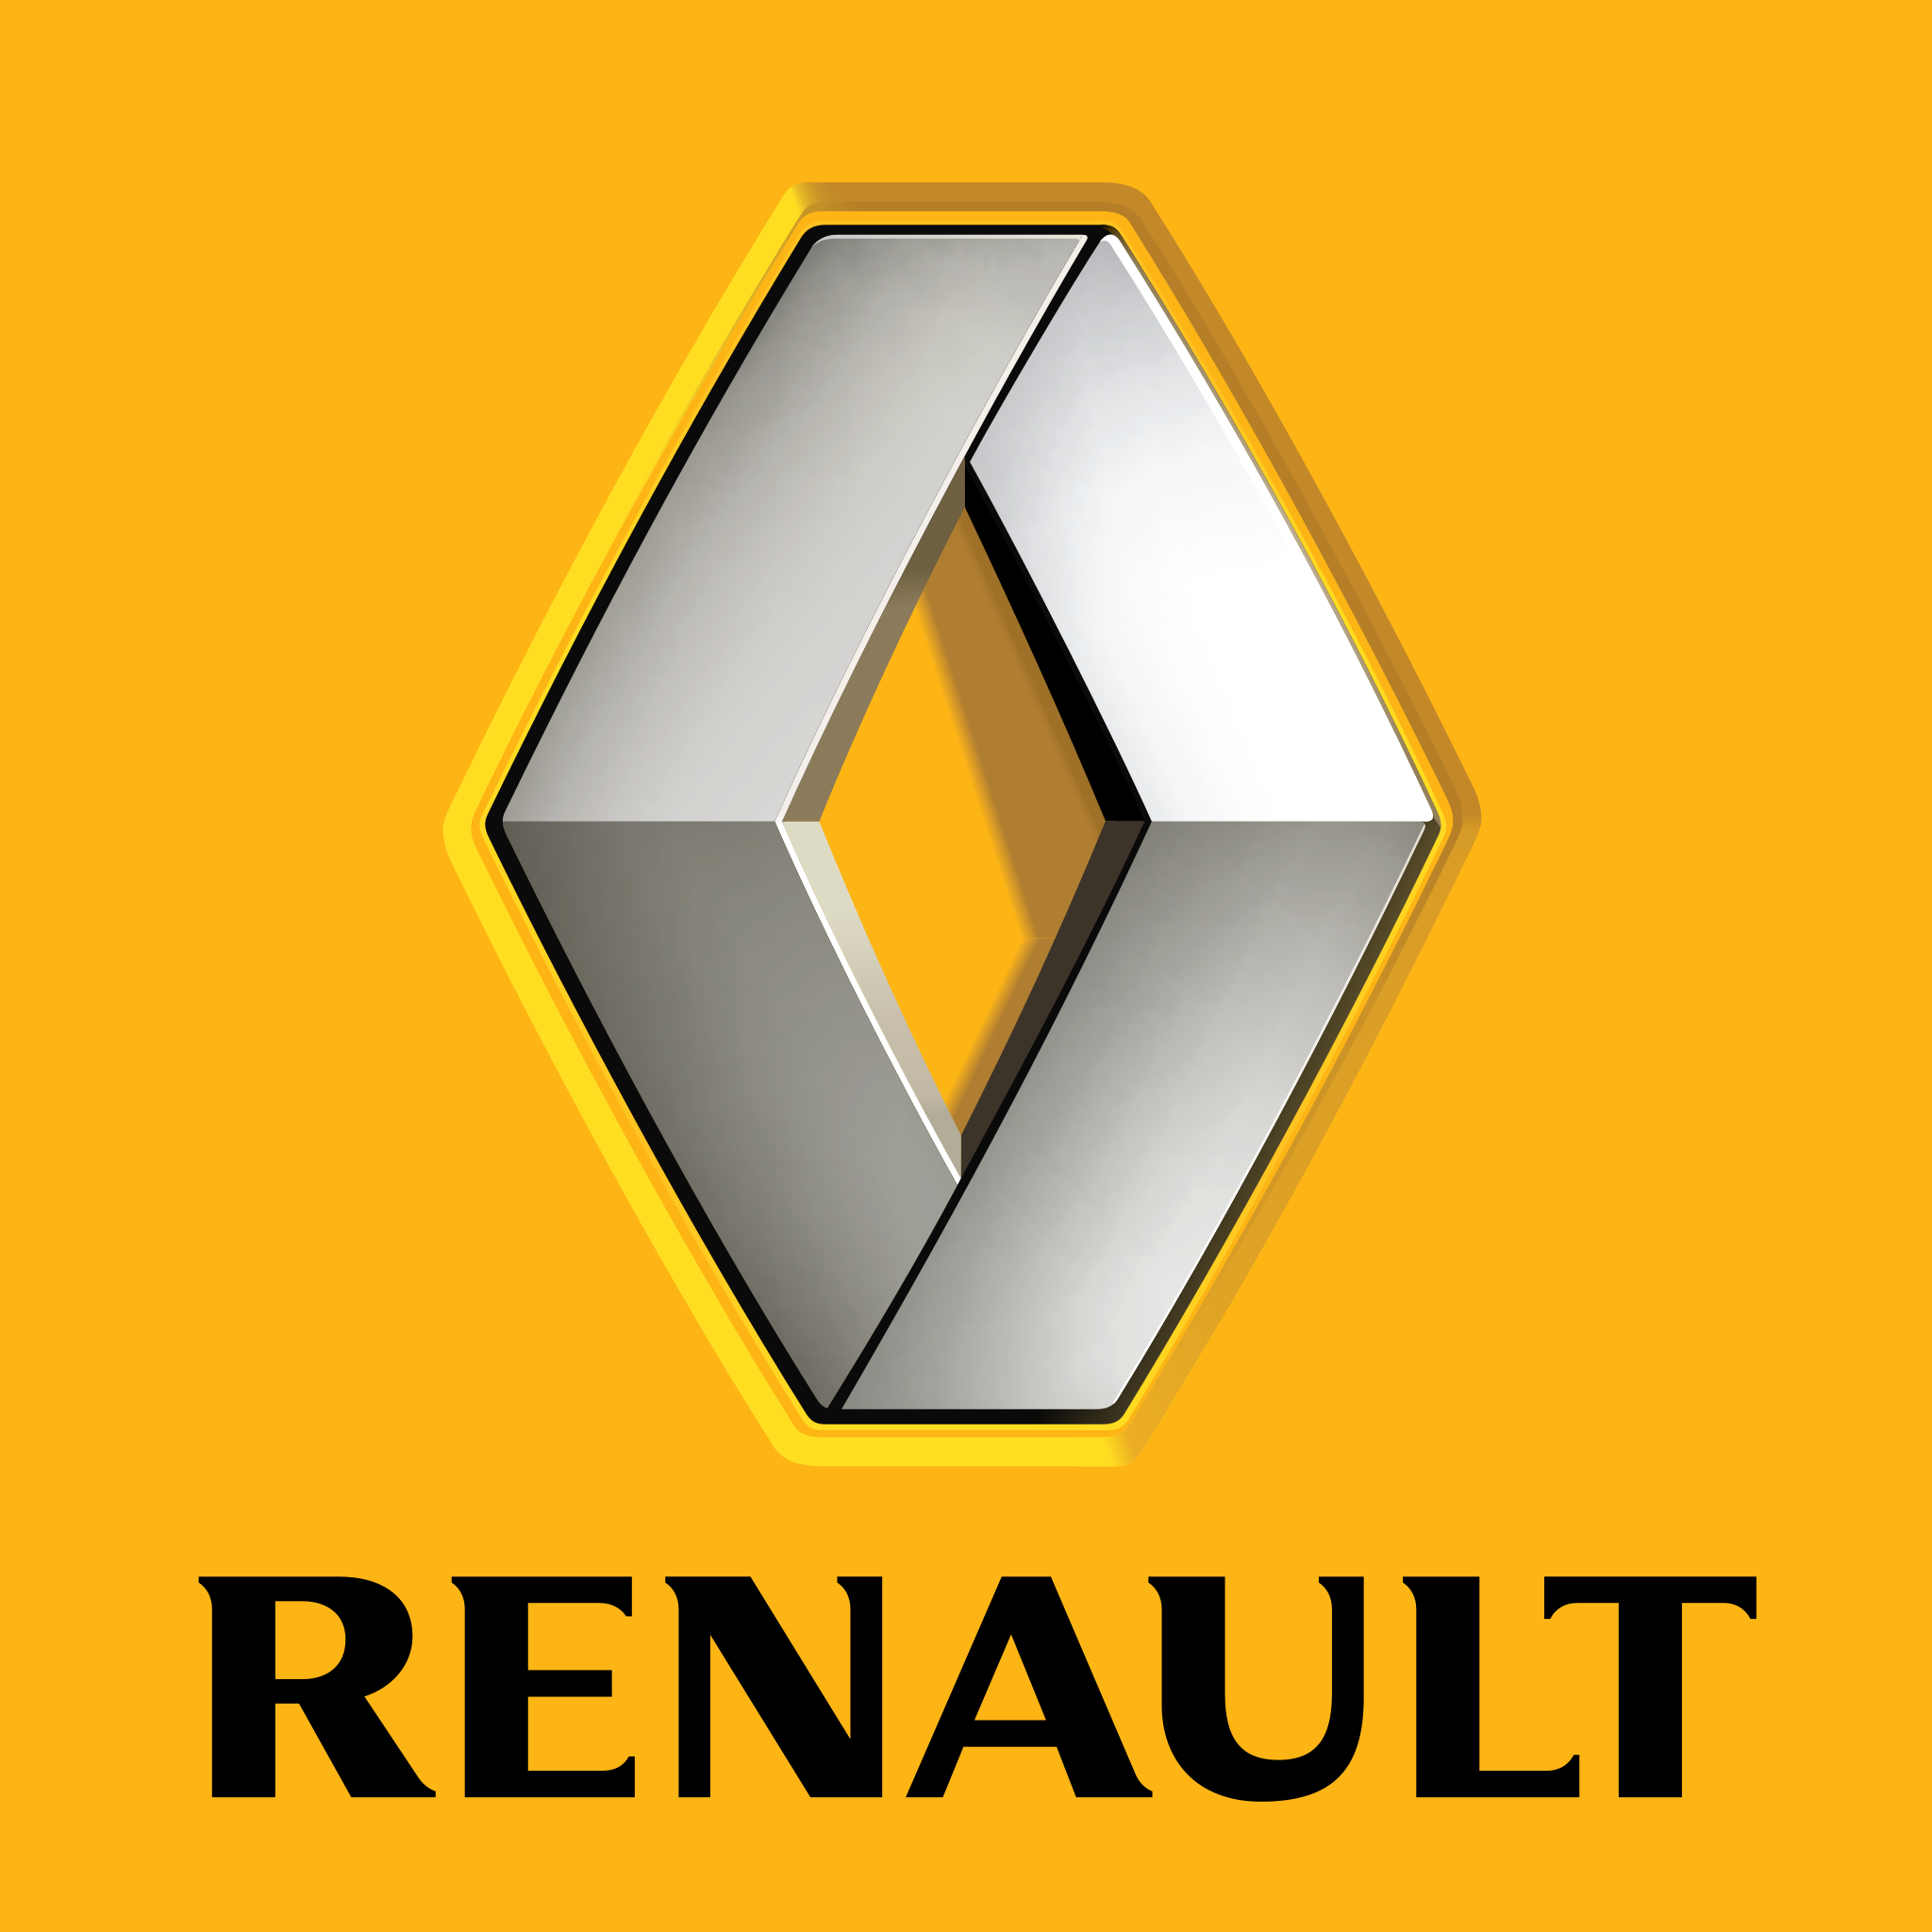 Renault Logo (2007) 2048x2048 HD png - Renault PNG